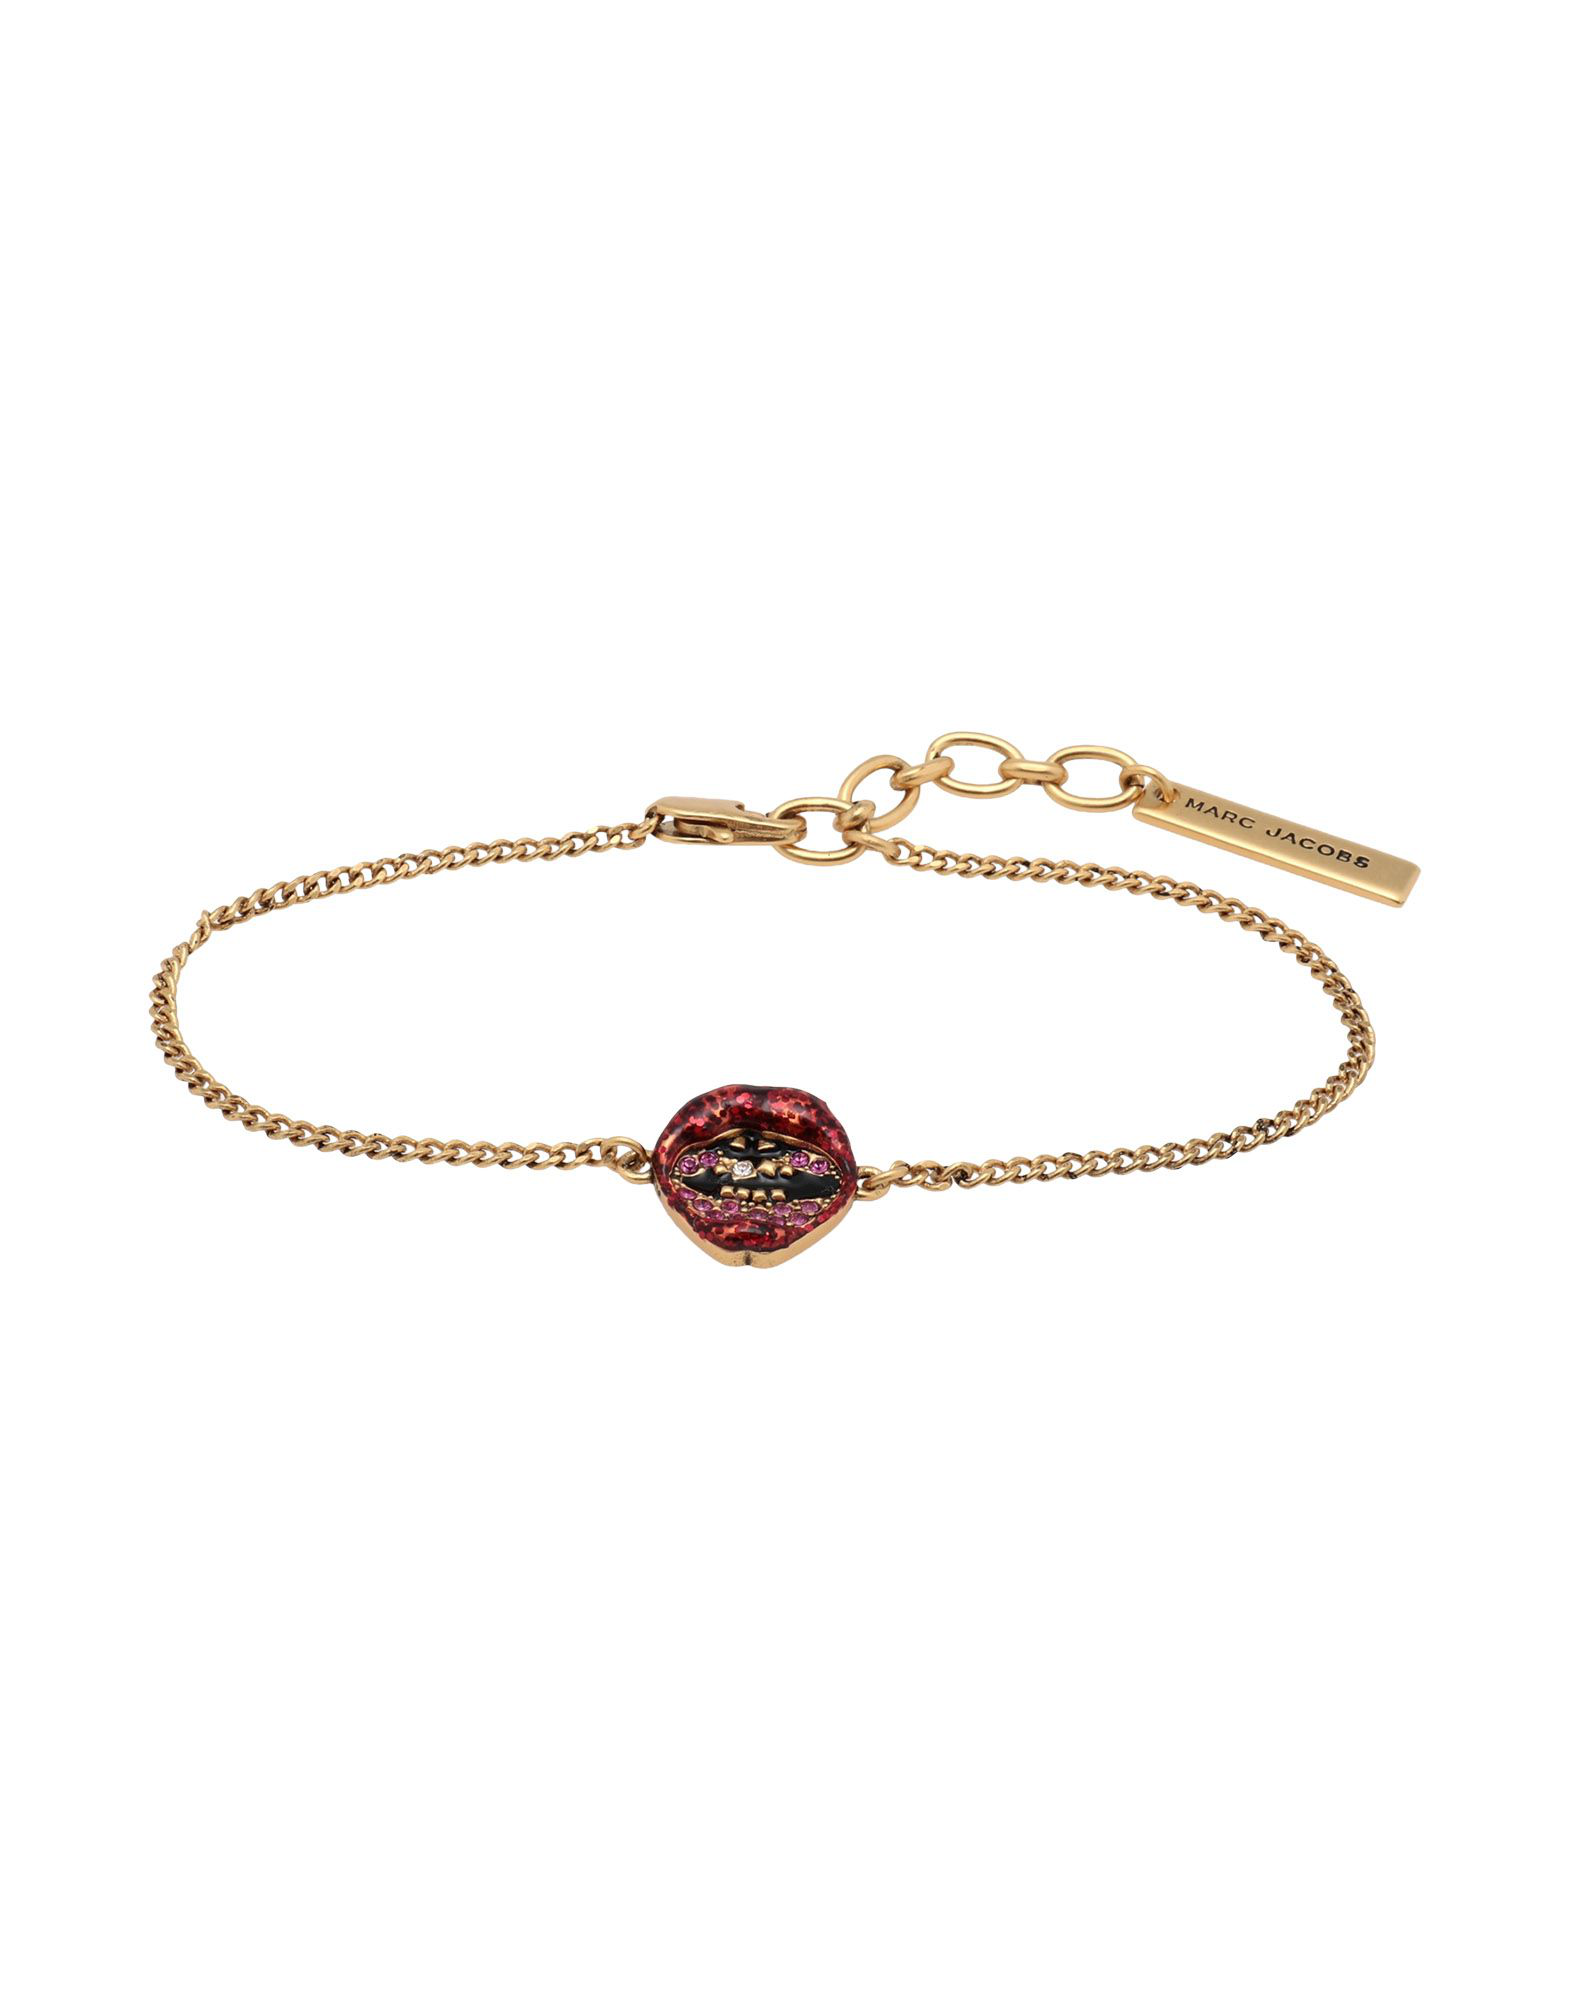 Marc Jacobs Bracelet In Gold